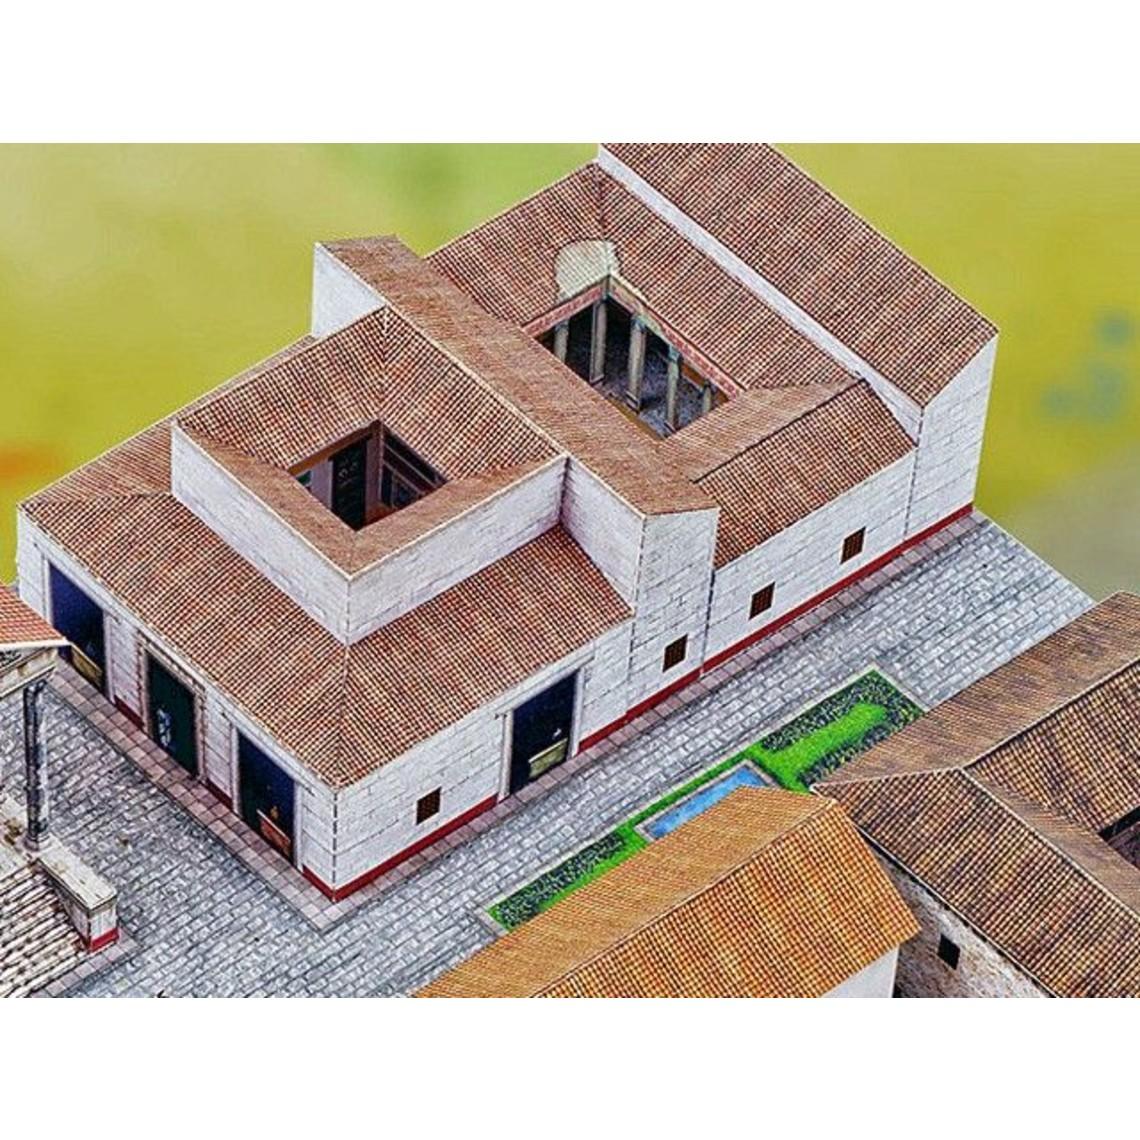 Model byggesæt romersk by